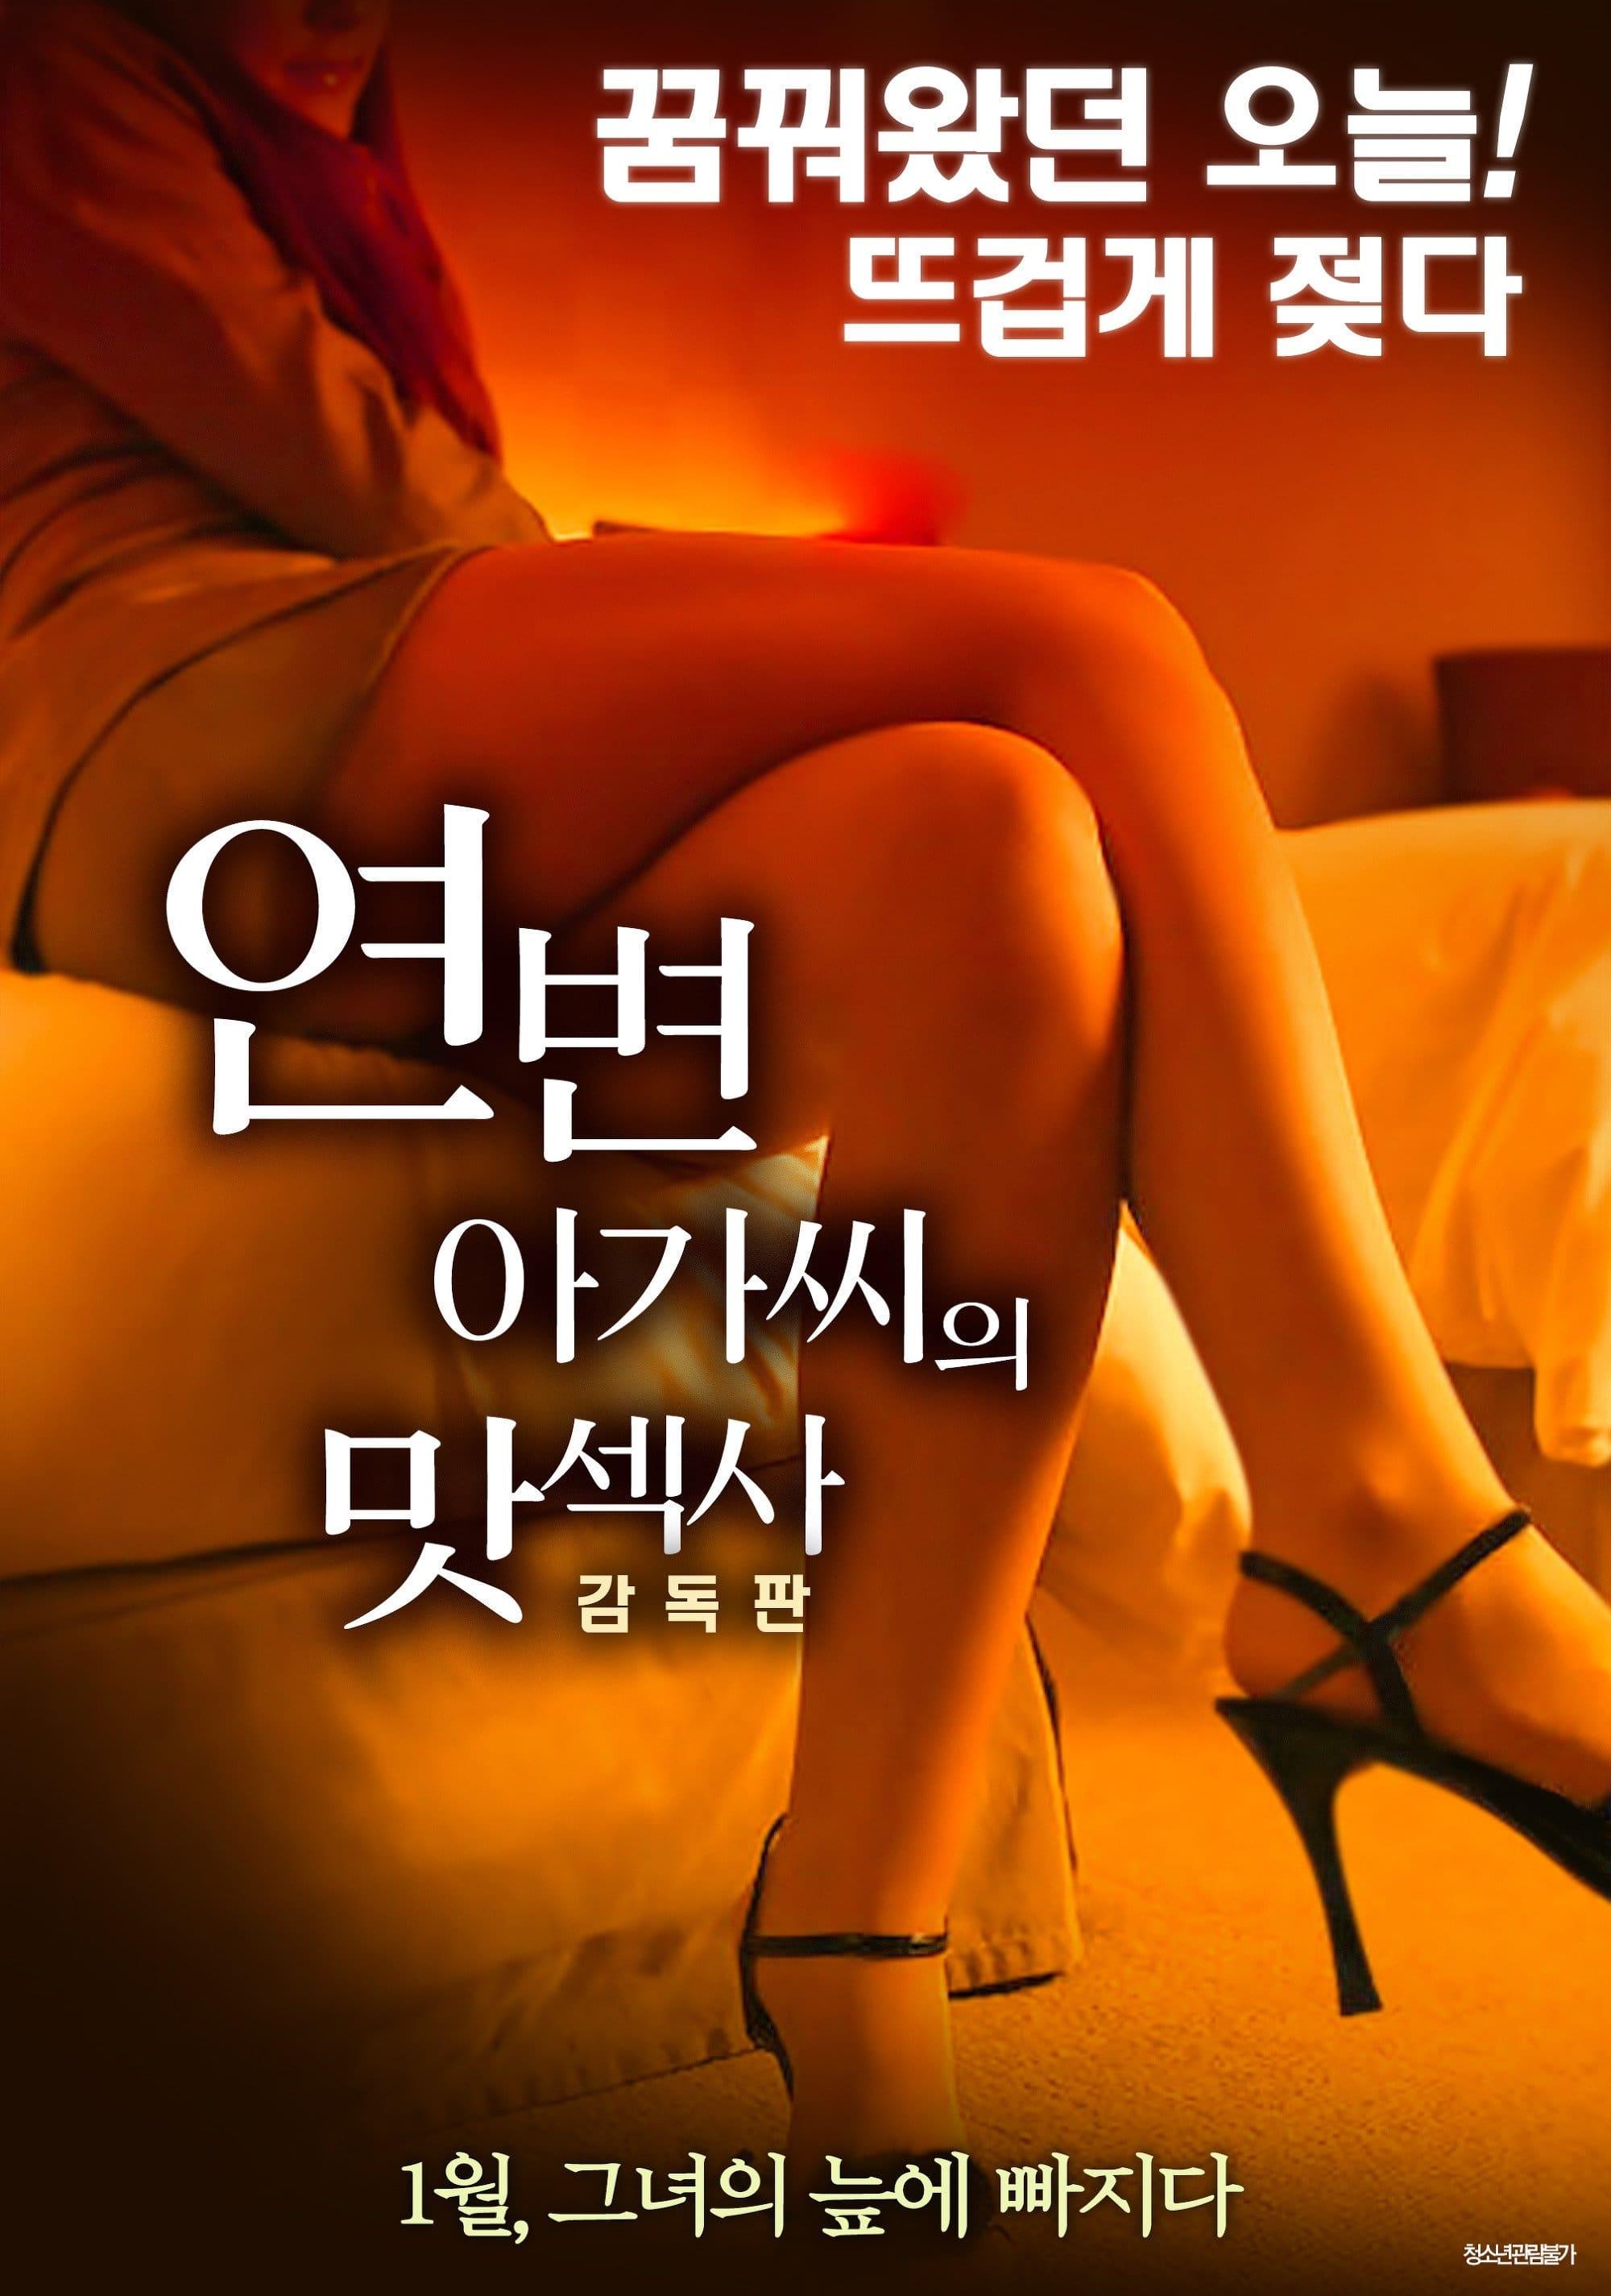 Lady's Tasty Sex - Director's Cut